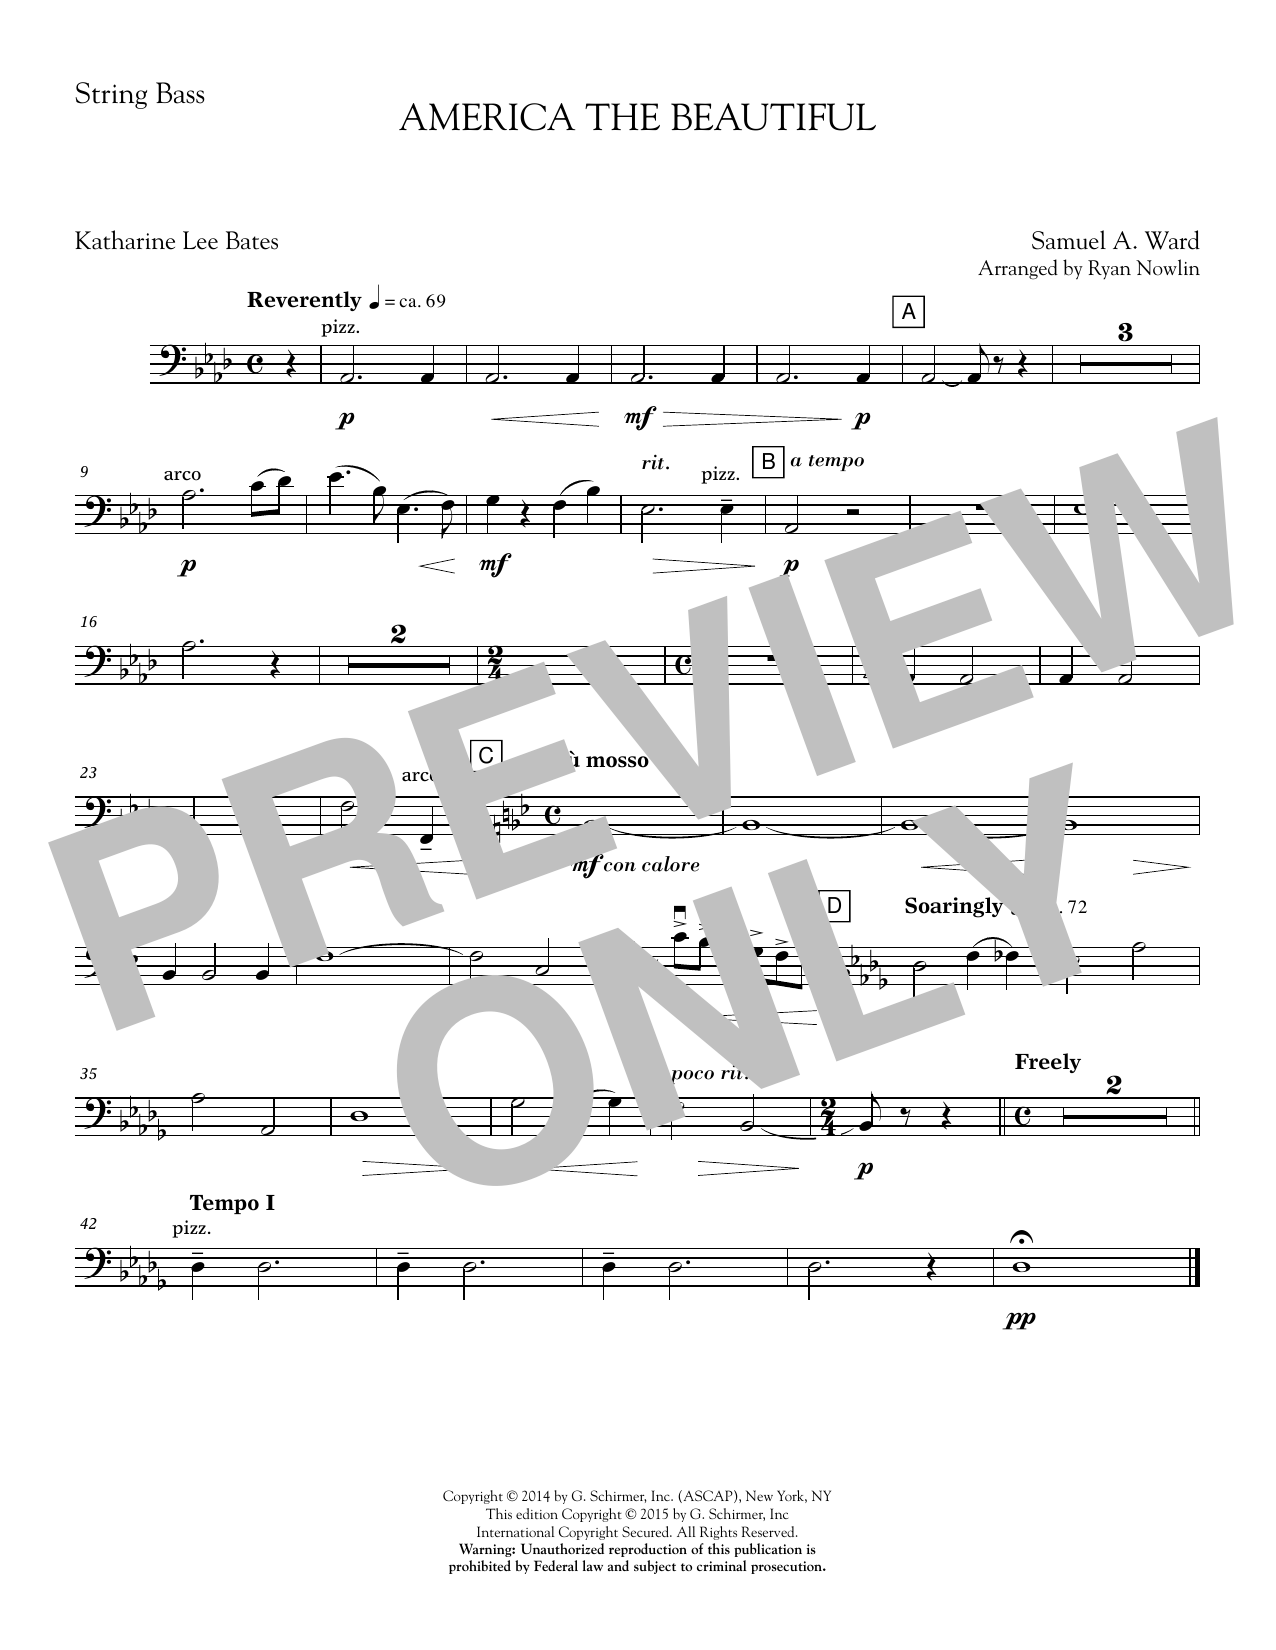 America, the Beautiful - Double Bass Sheet Music